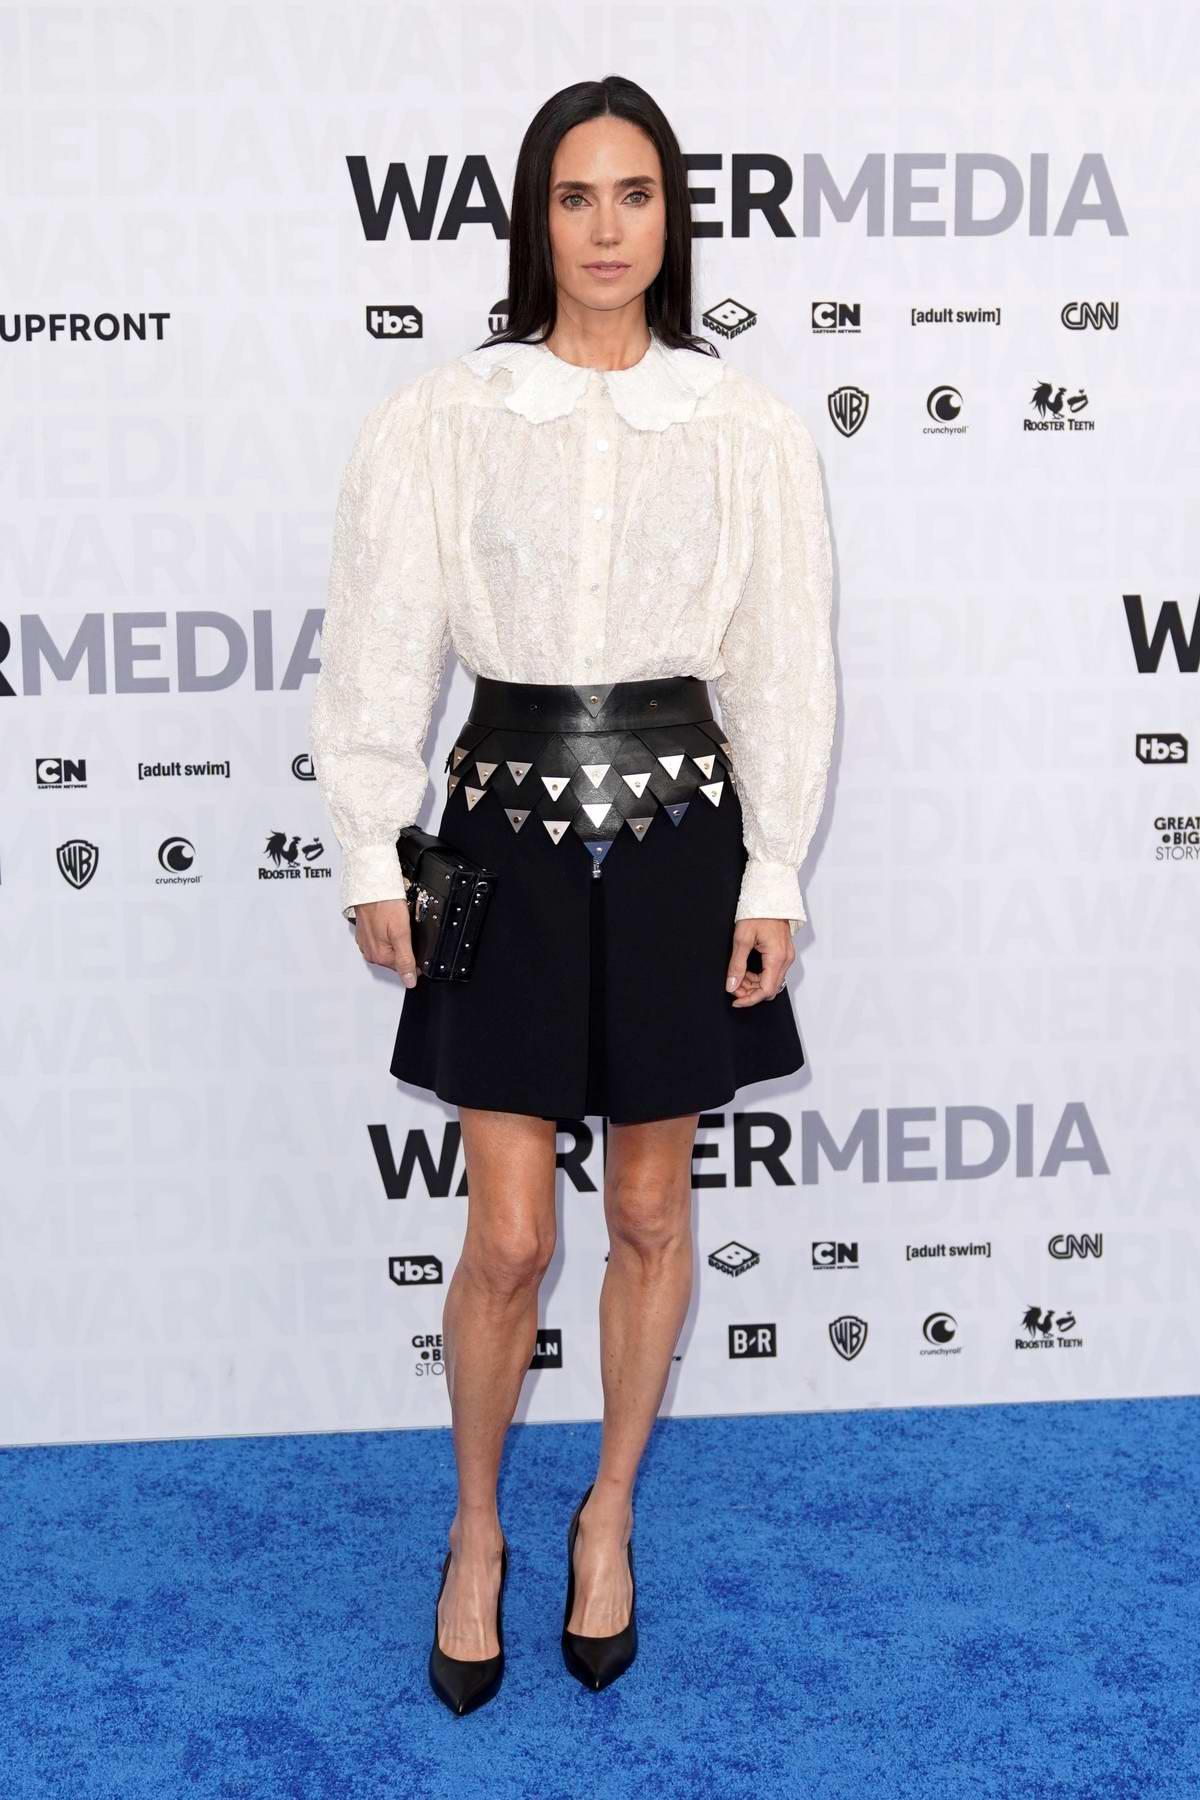 Jennifer Connelly attends the WarnerMedia Upfront Presentation in New York City